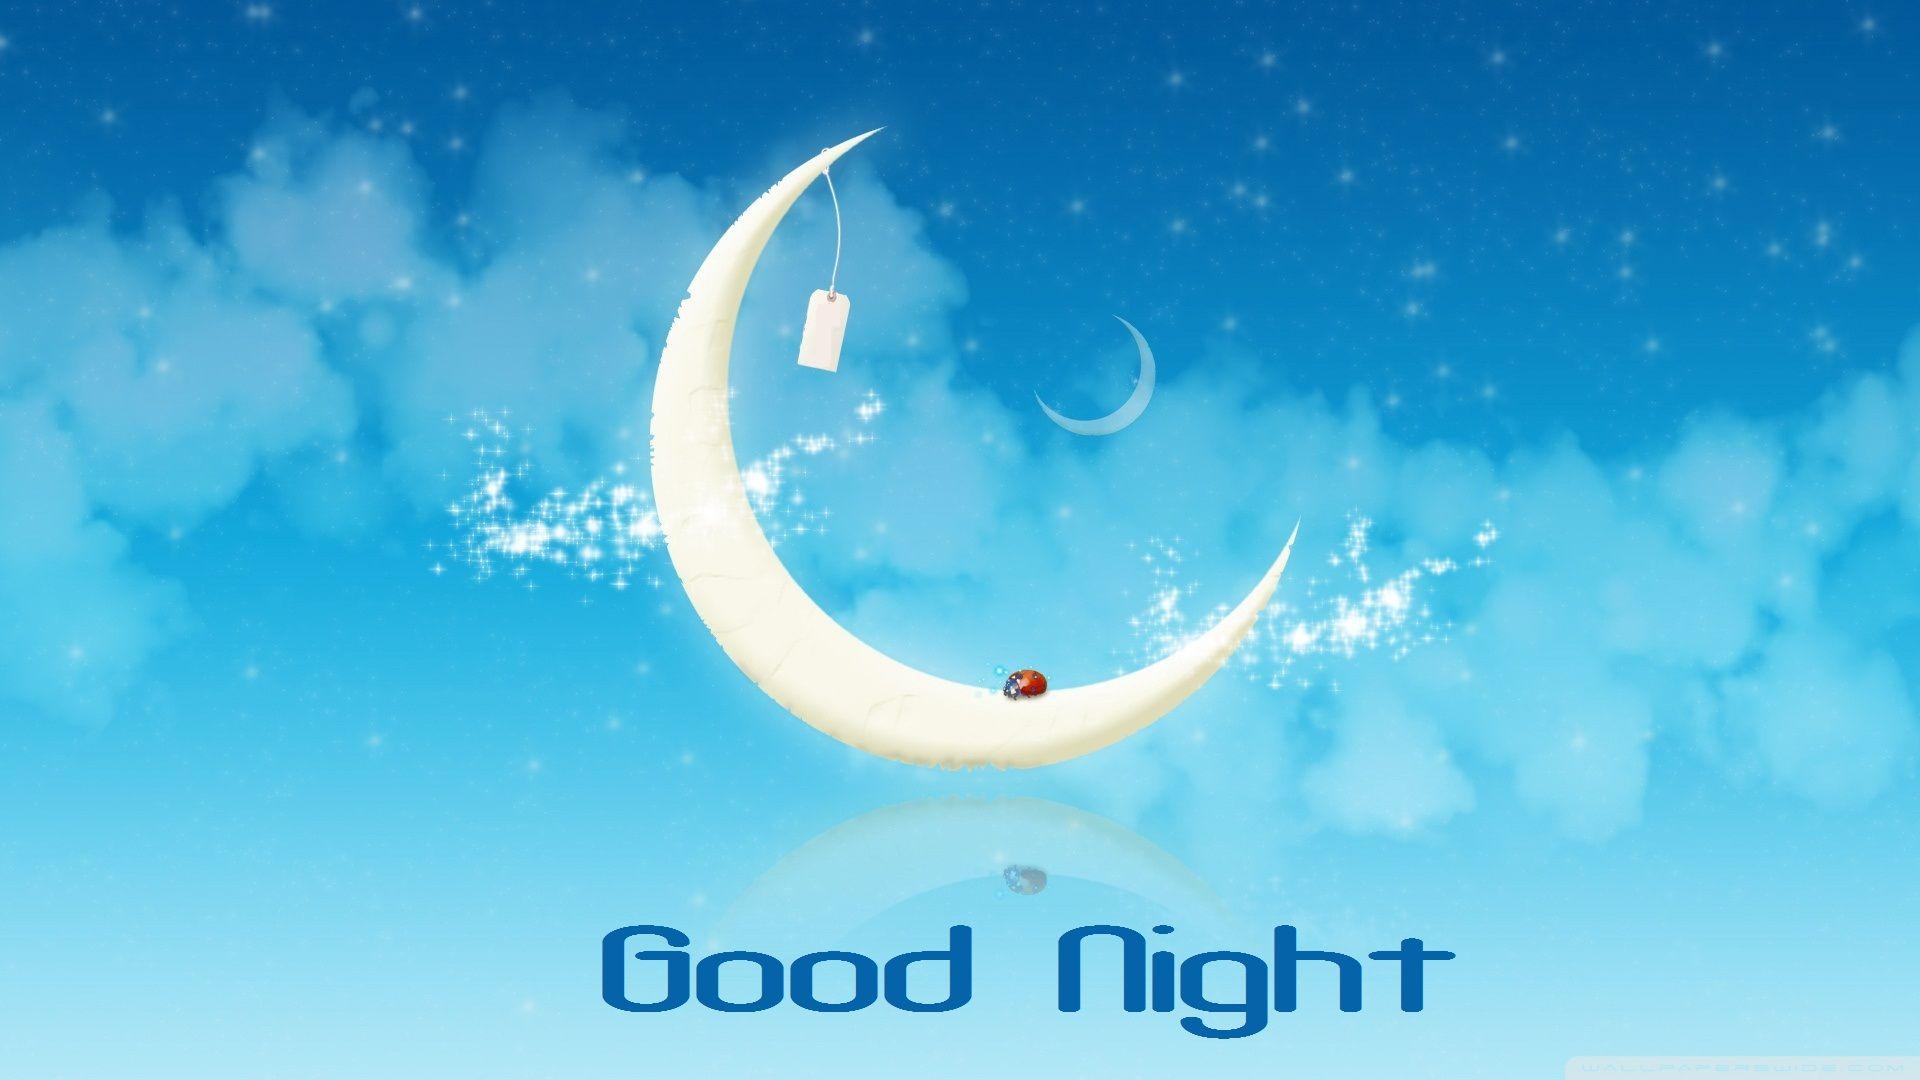 Good night Free Download Good Night